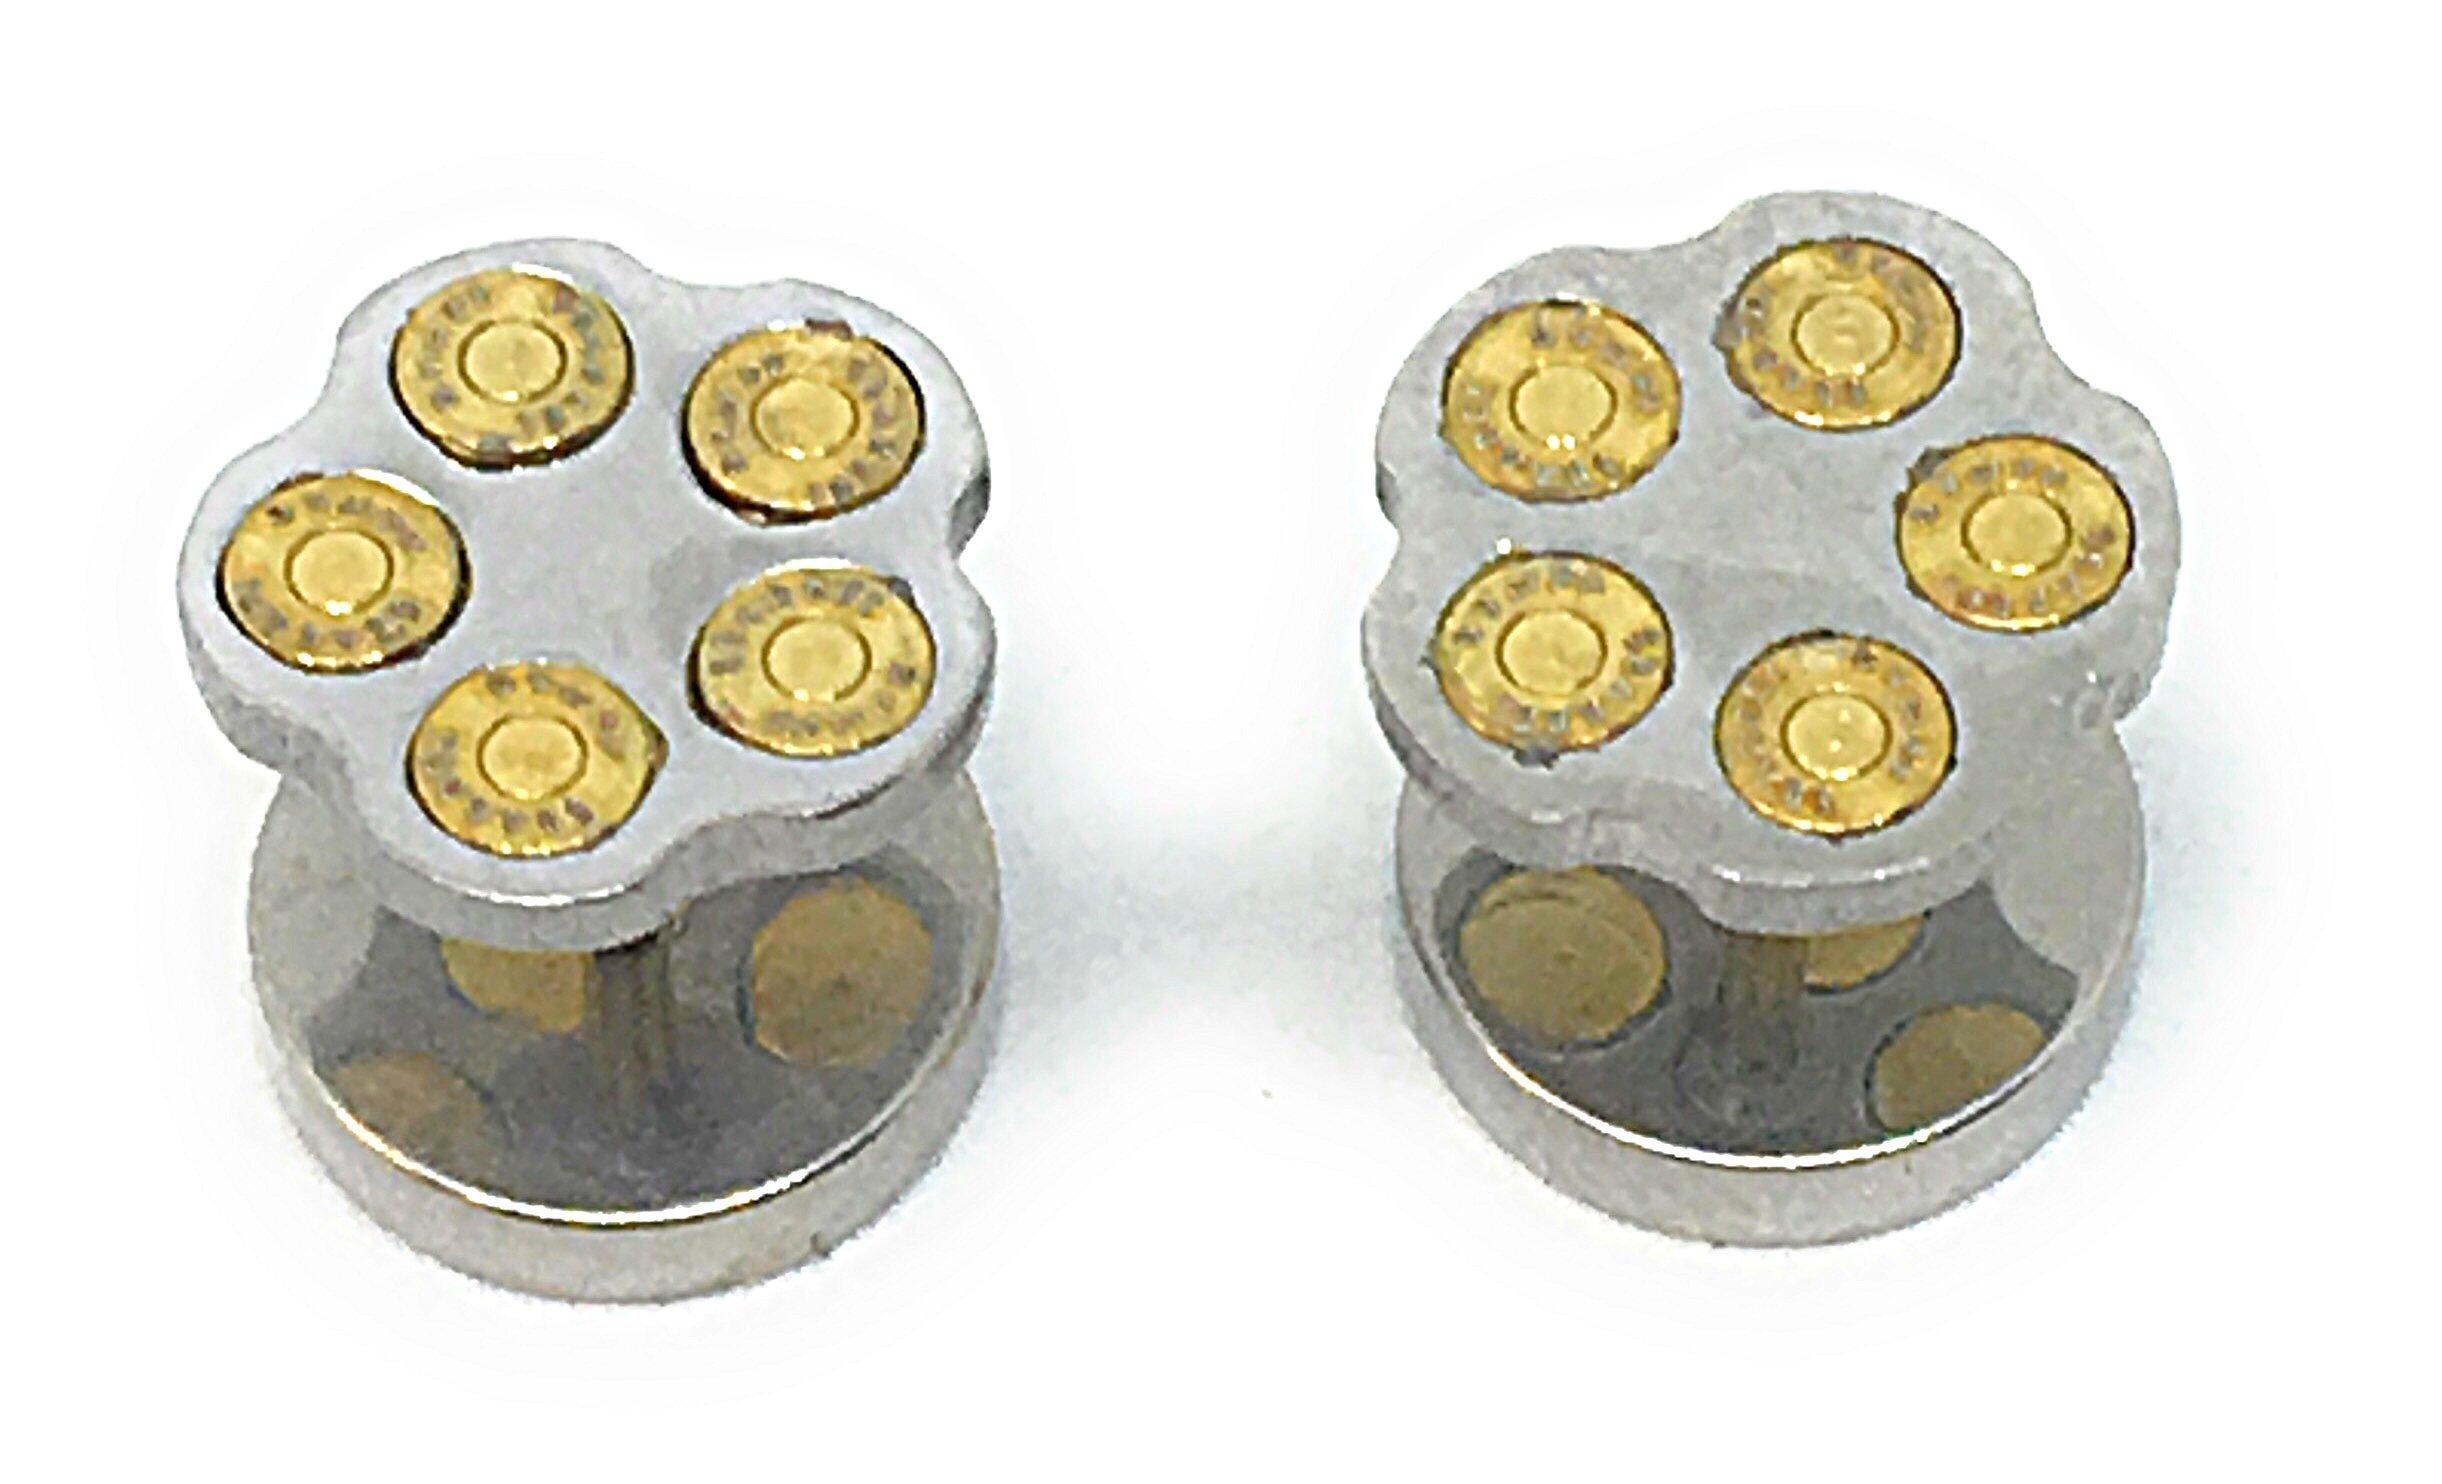 HYPOALLERGENIC Bullet Earrings for Men Stud Earring Screw Back Stainless Steel [Multiple Colors] - Unisex (Silver)